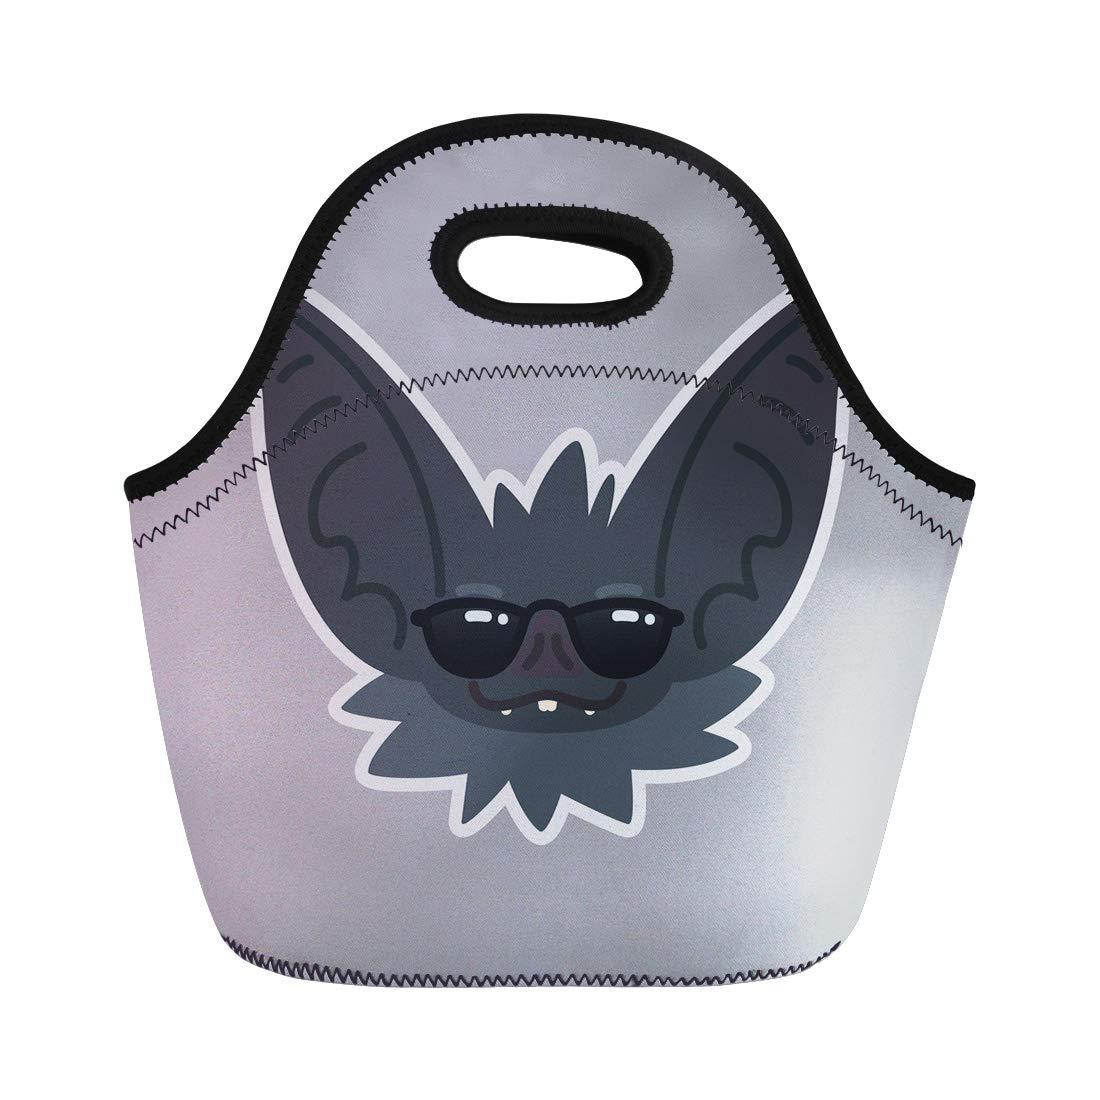 77baa351189d Amazon.com: Semtomn Neoprene Lunch Tote Bag Autumn Halloween Ghosts ...